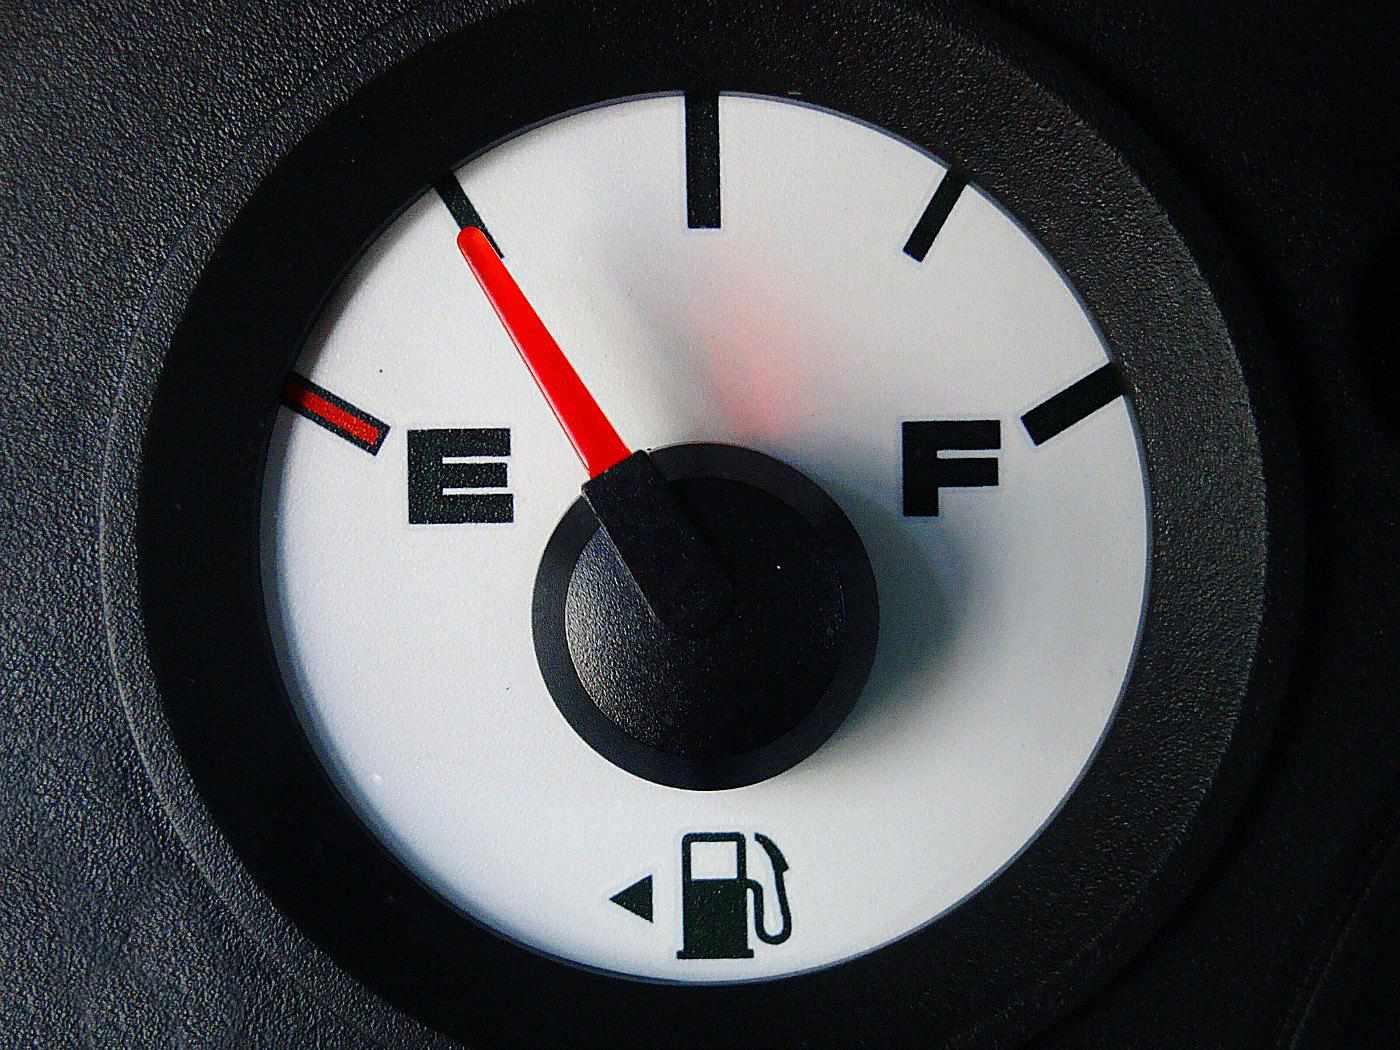 Pinterest_RoadTripHacks_FuelGaugeGas.jpg